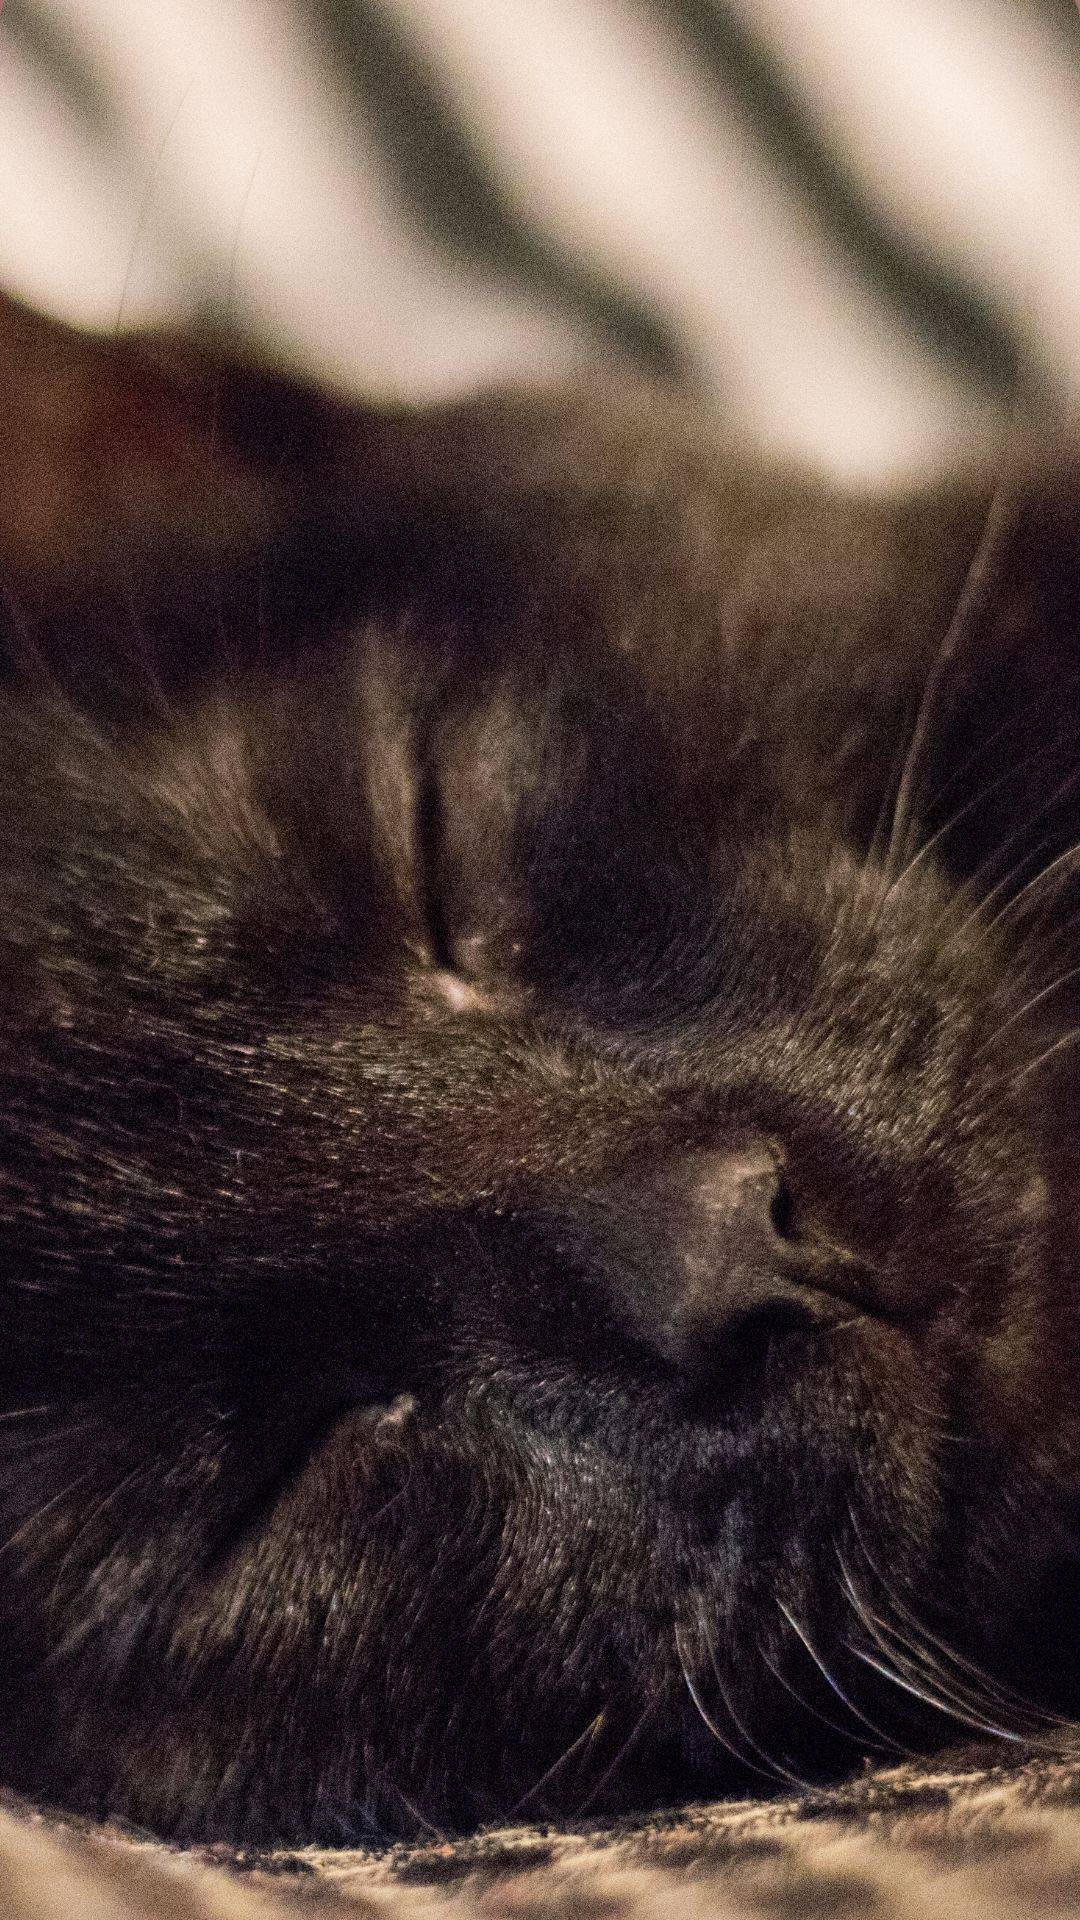 blacks cat sleeping